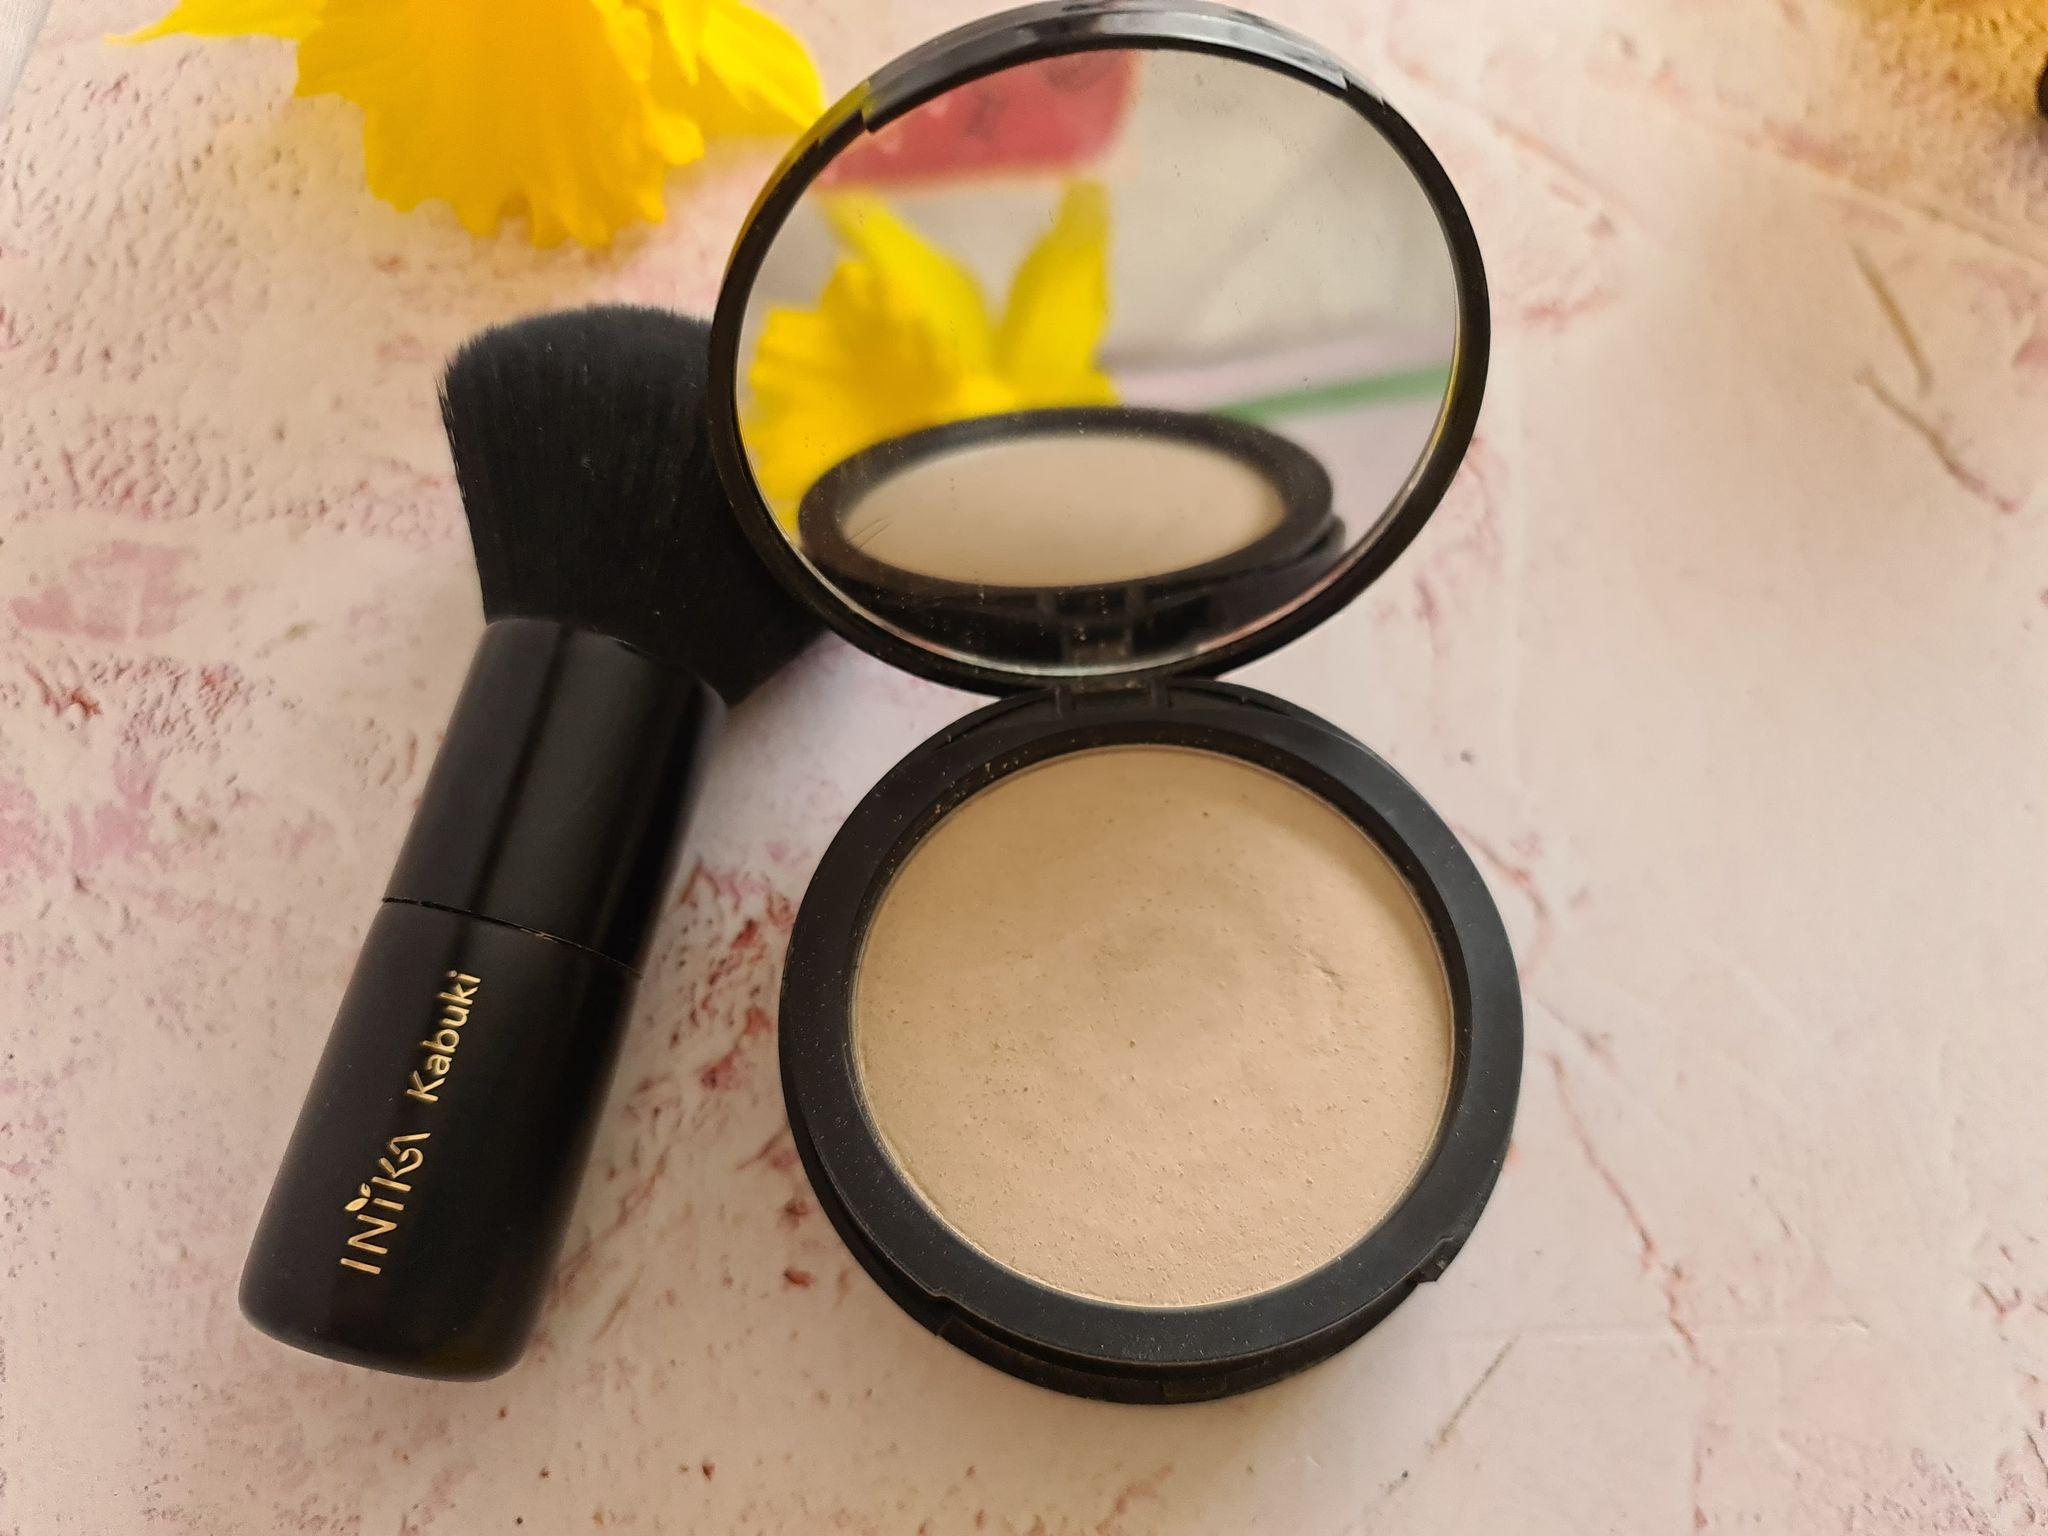 Emani HD Bamboo Setting Powder review